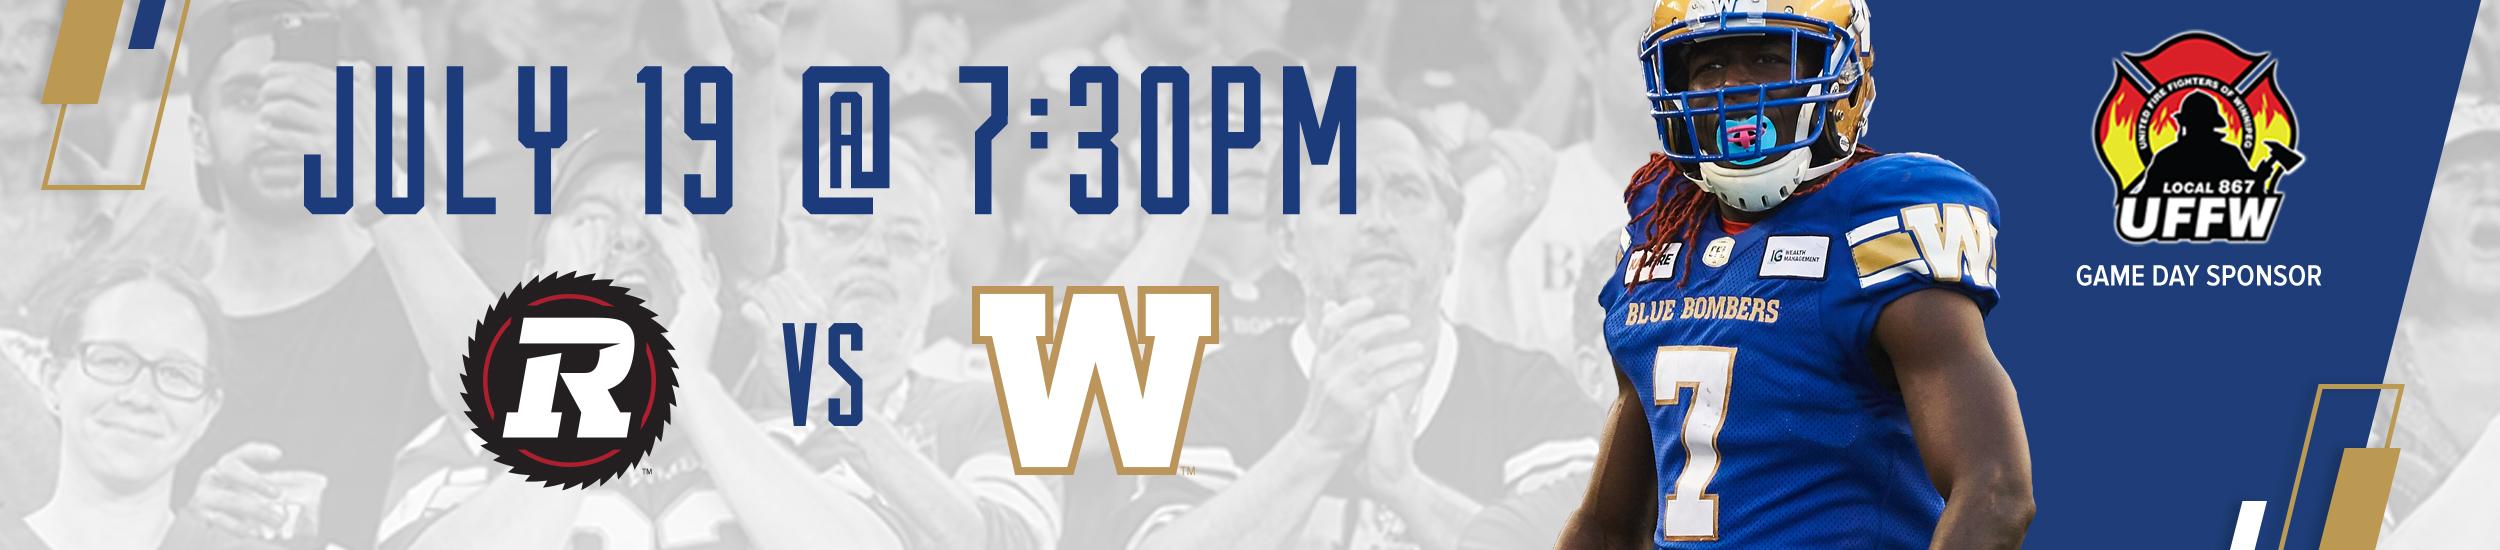 Winnipeg Blue Bombers vs. Ottawa REDBLACKS - Friday, July 19 2019